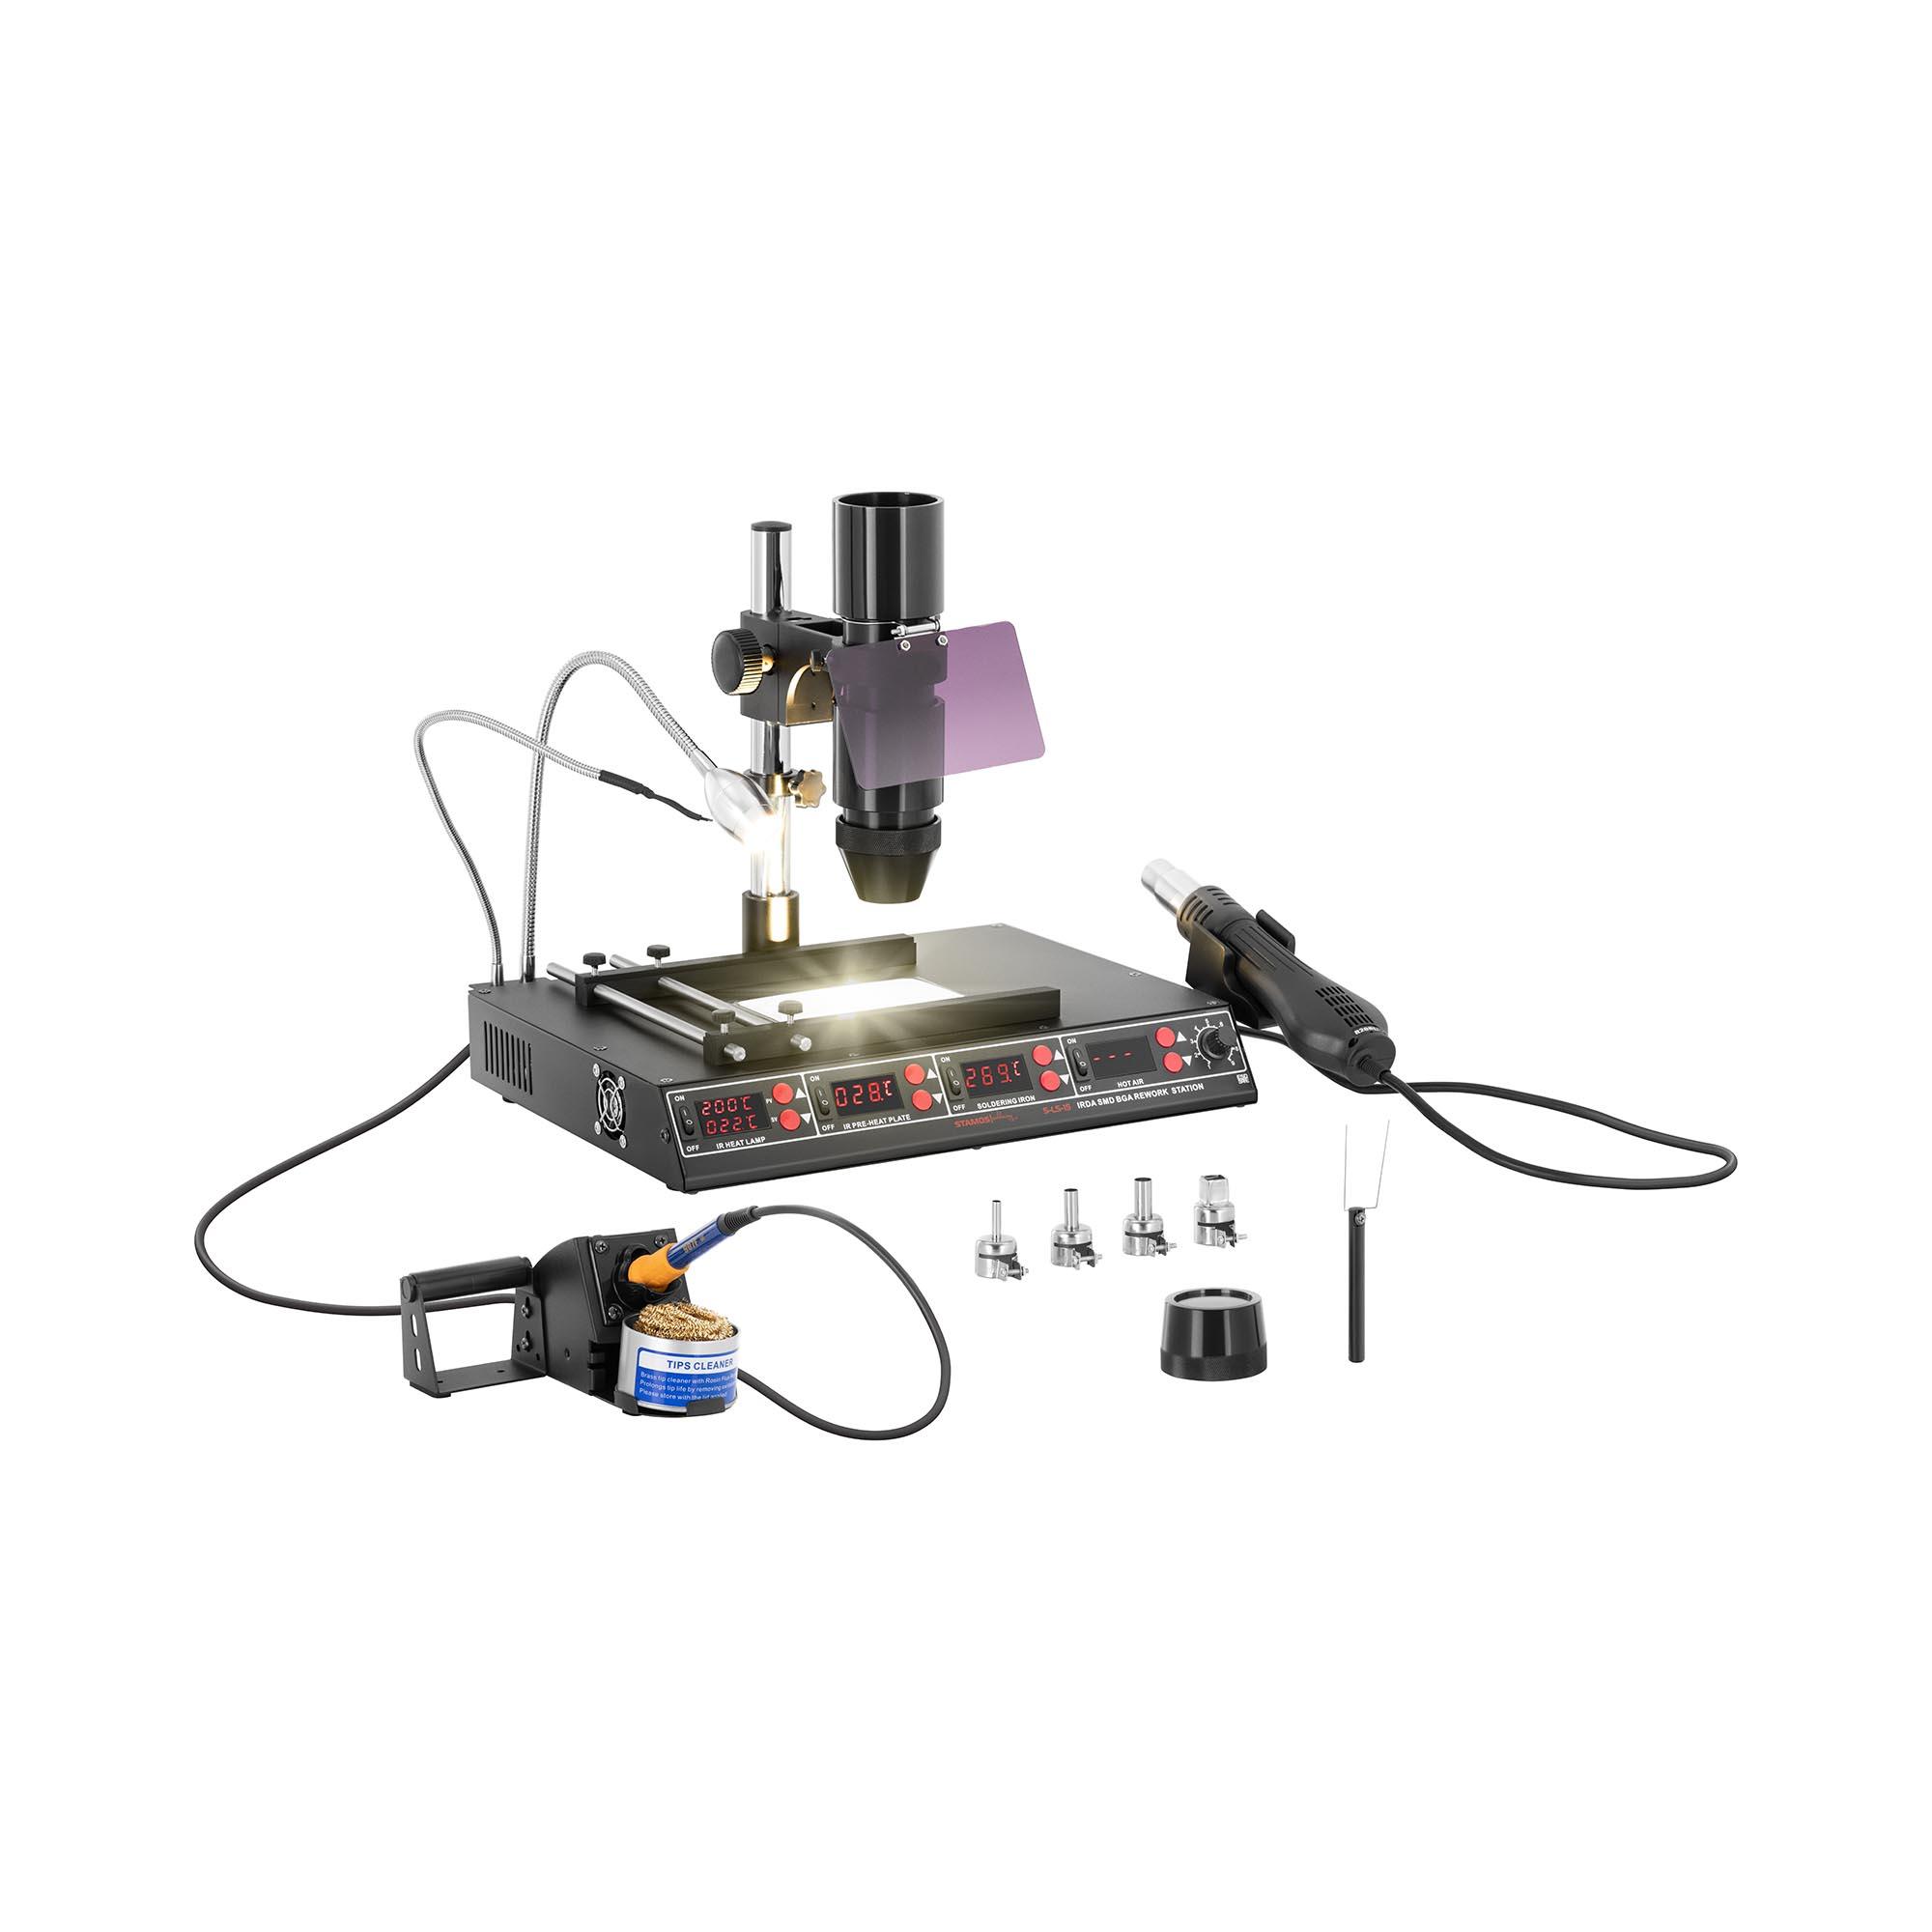 Stamos Soldering Lötstation mit Vorwärmplatte und Infrarotlampe - 1450W - 4 x LED - Basic Lötstation S-LS-15 Basic